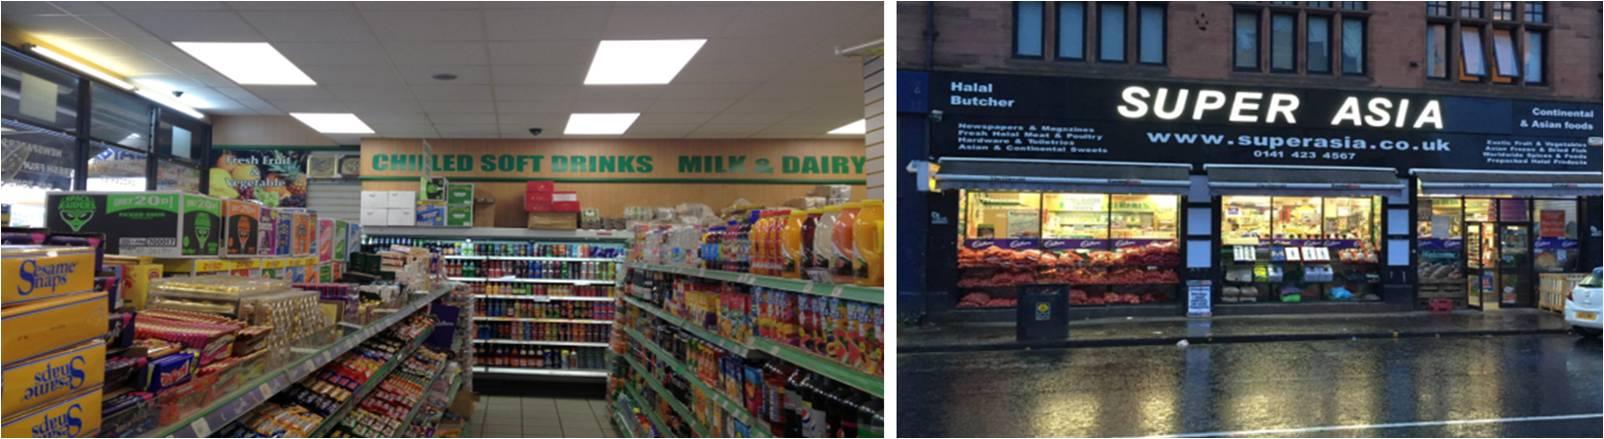 LED Distribution | Projects | Supermarket (Superasia) | Glasgow, Scotland